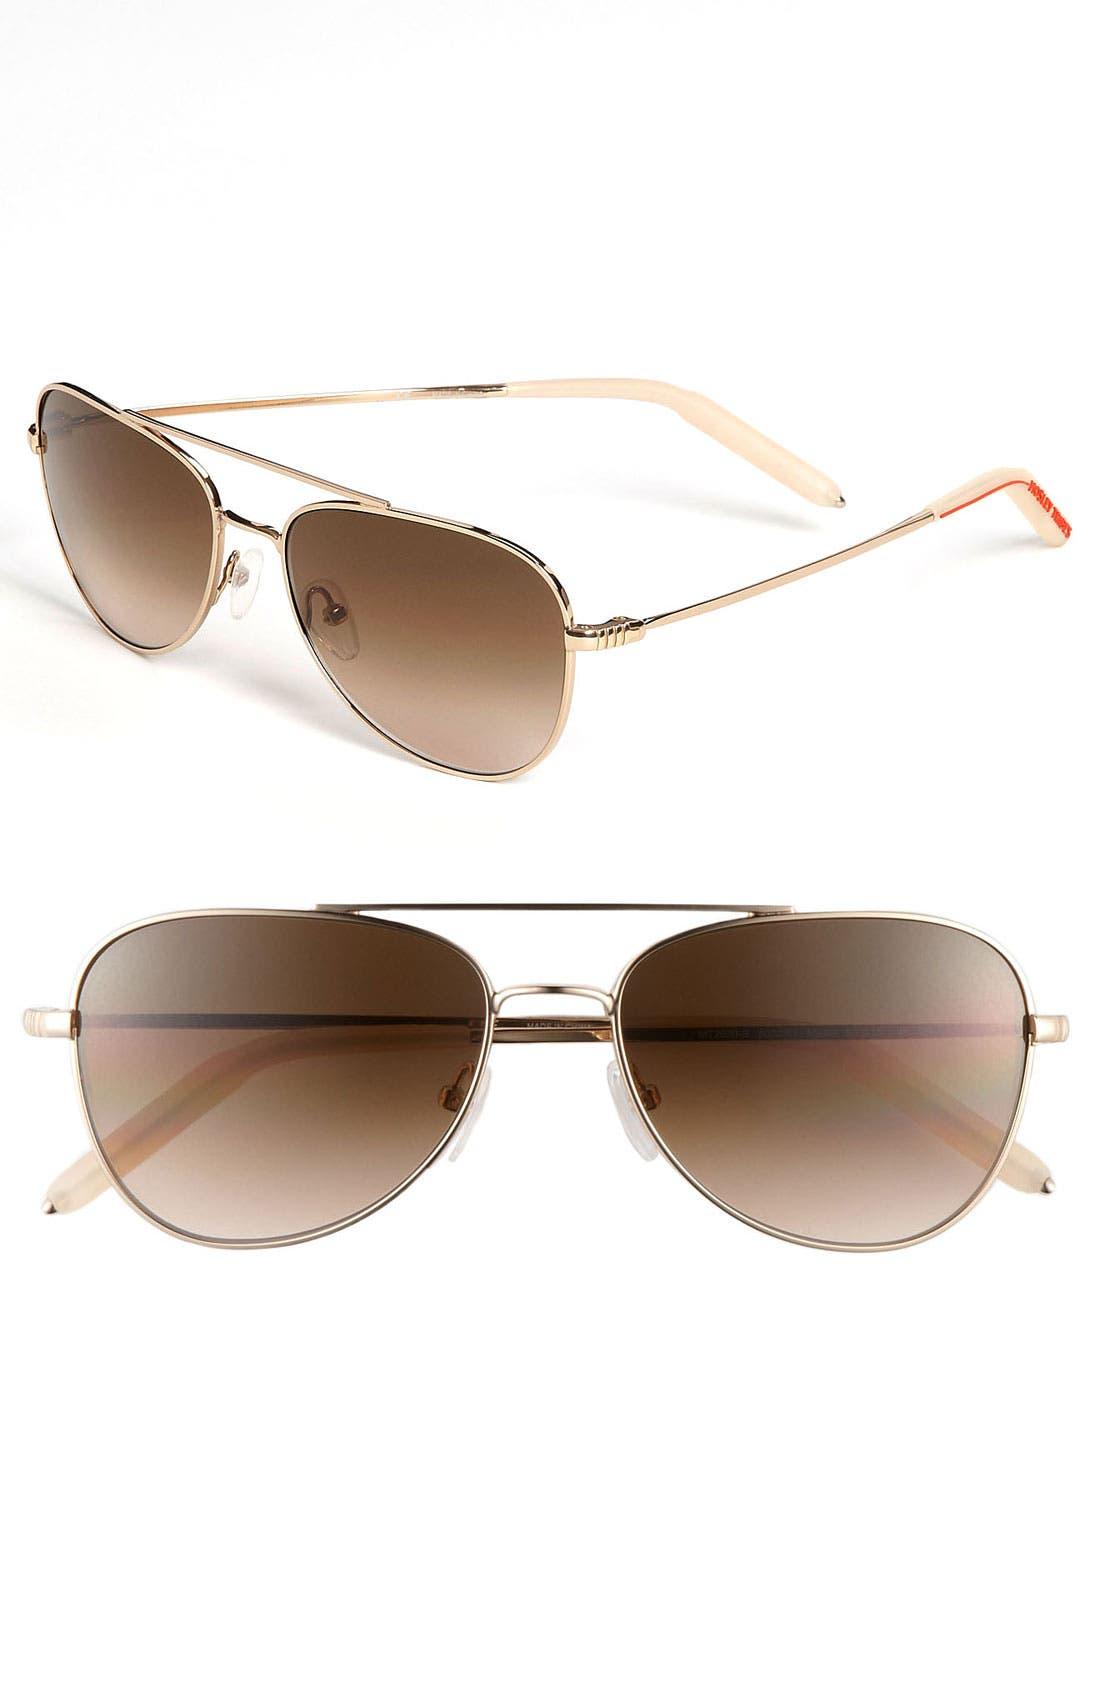 Main Image - Mosley Tribes 'Mateo' Sunglasses